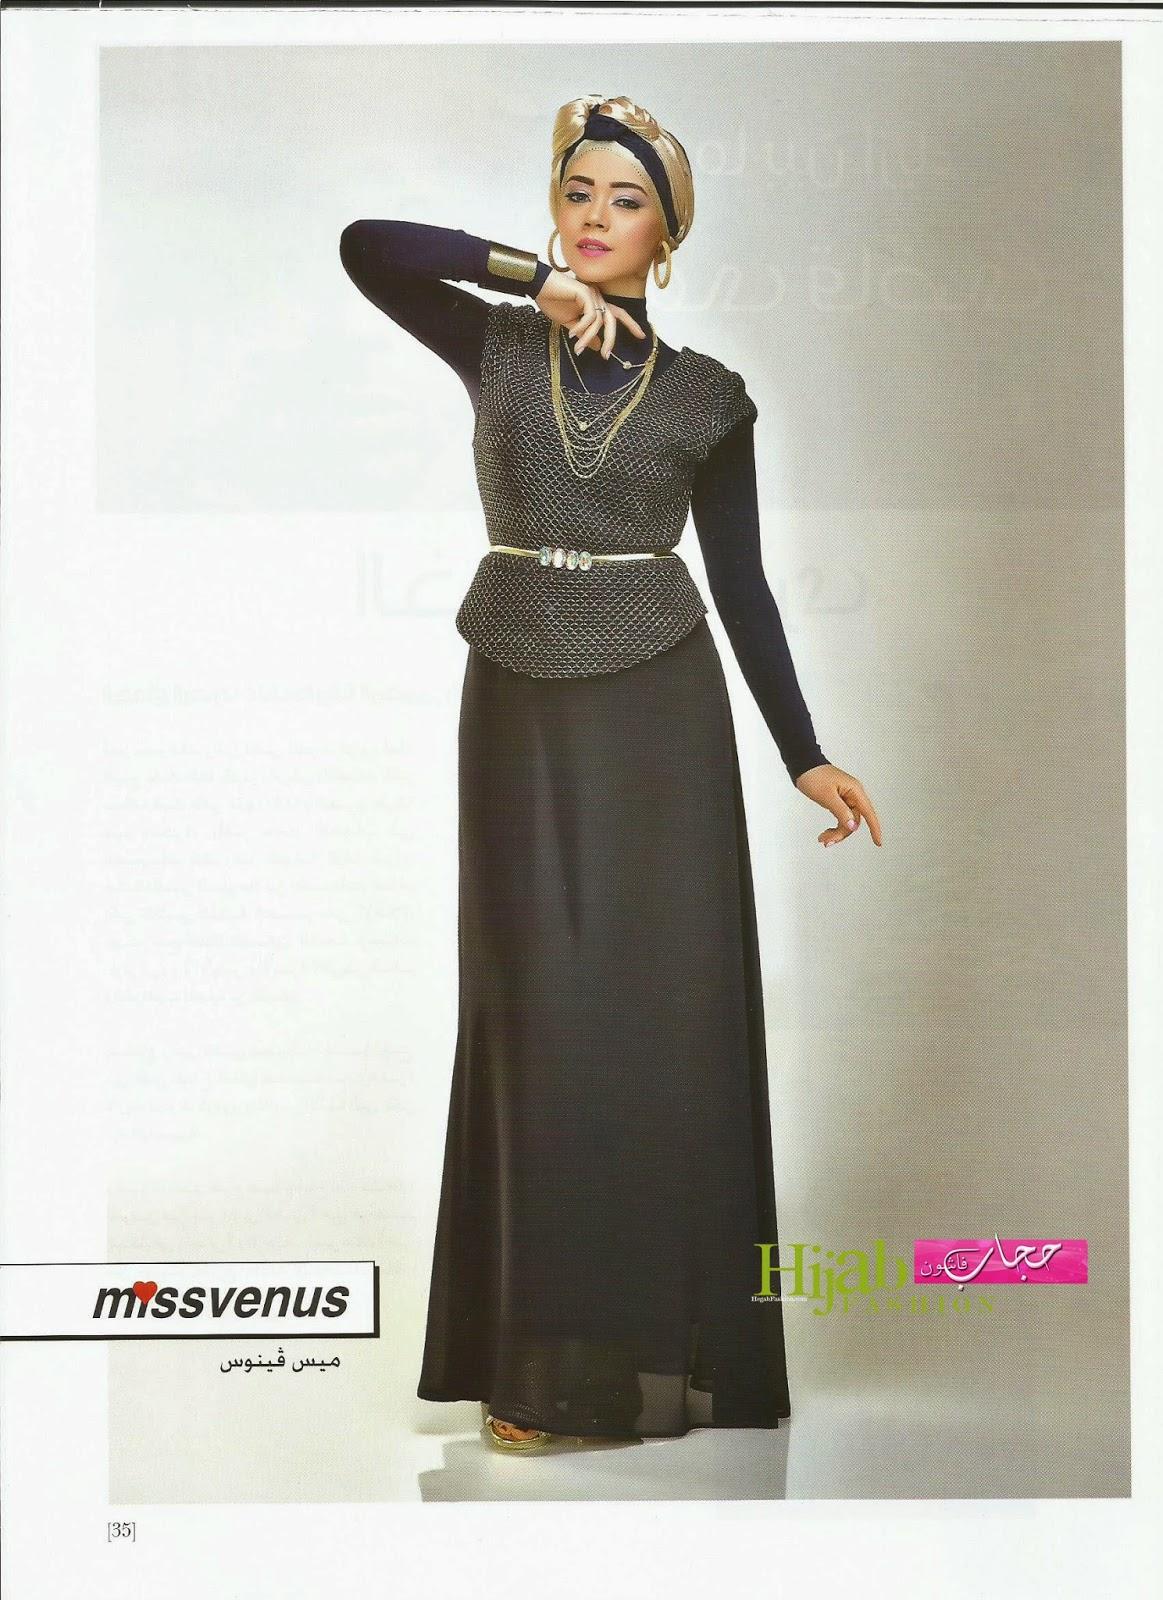 cee9bf957 ربيع وصيف 2015 - أزياء ميس فينوس Miss Venus - مجلة حجاب فاشون ابريل / مايو  2015